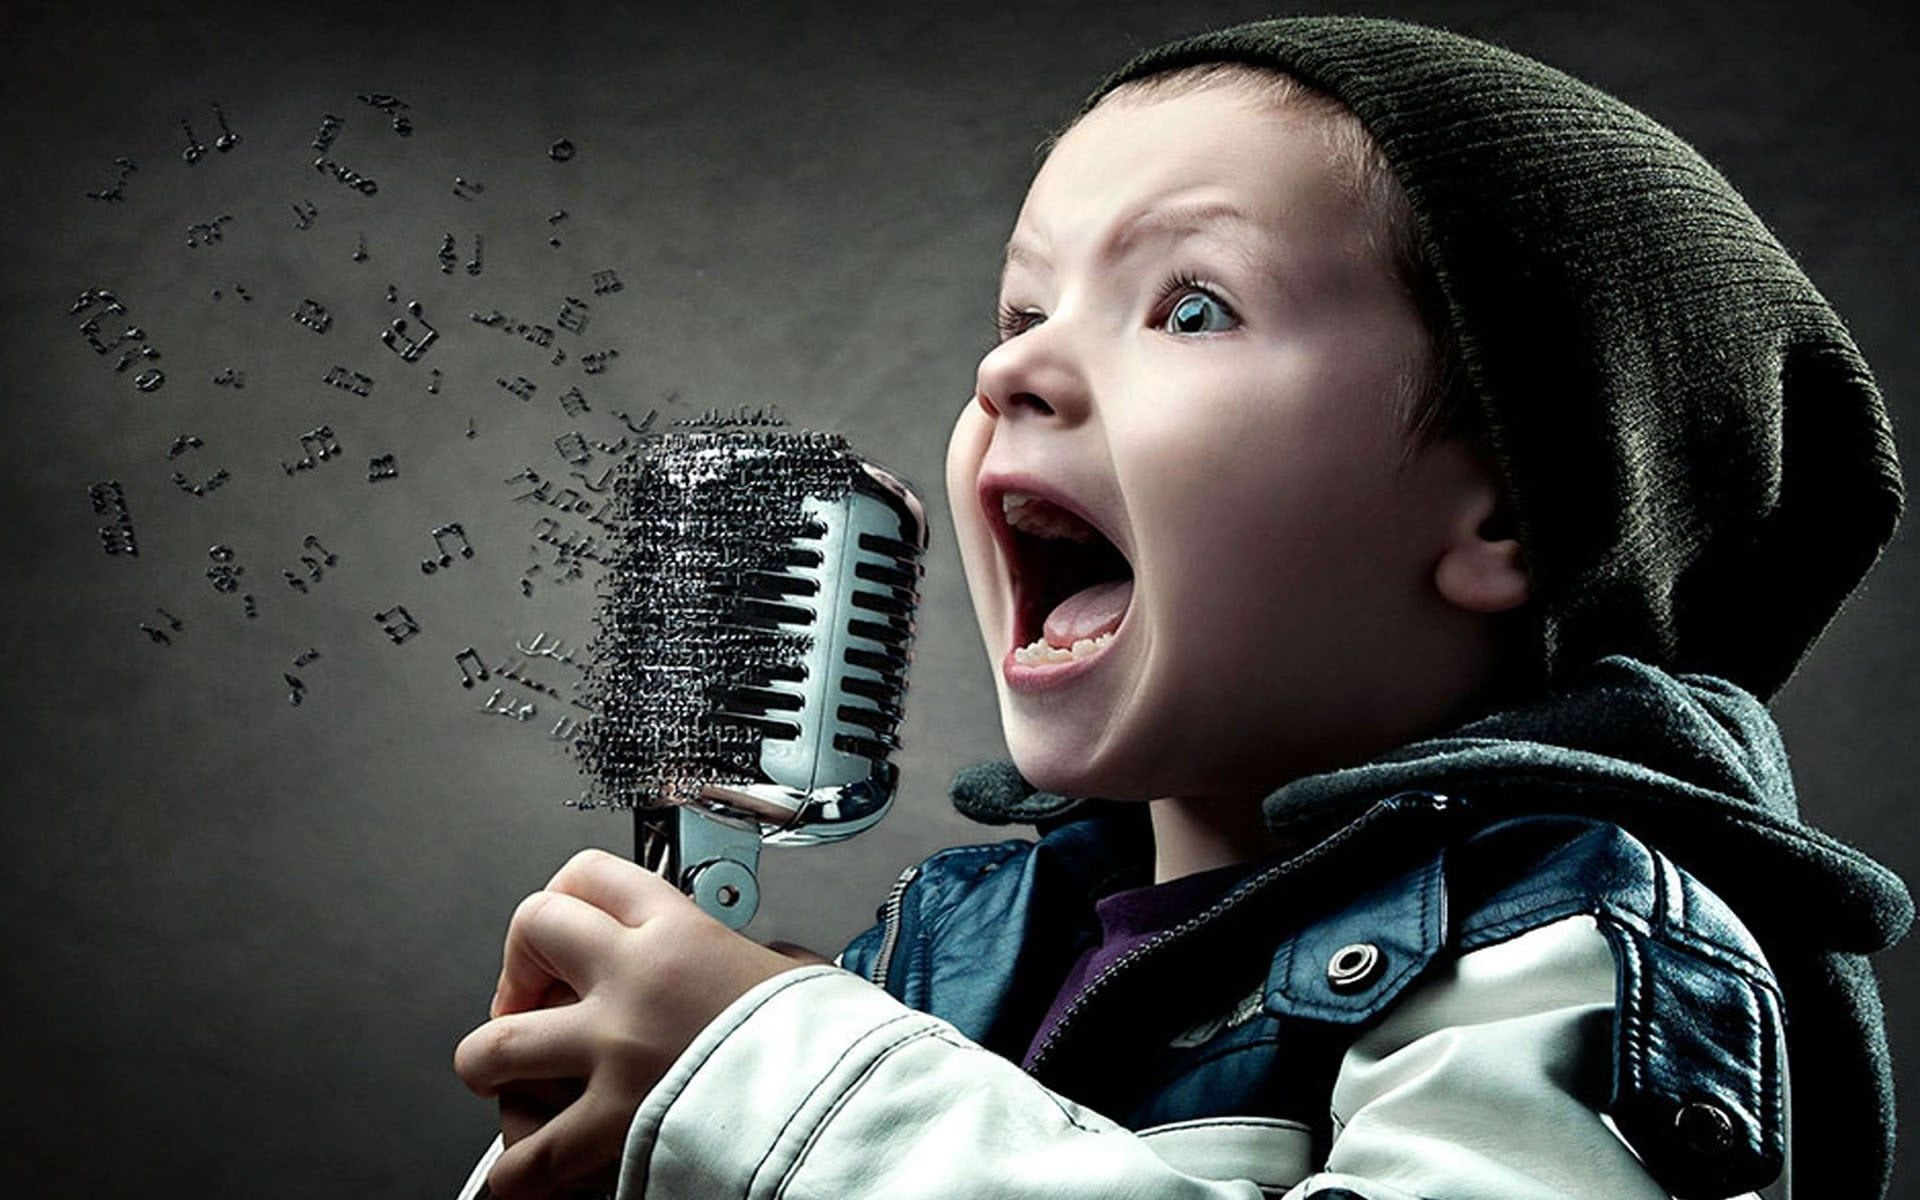 baiat-cu-hanorac-care-canta-la-microfon